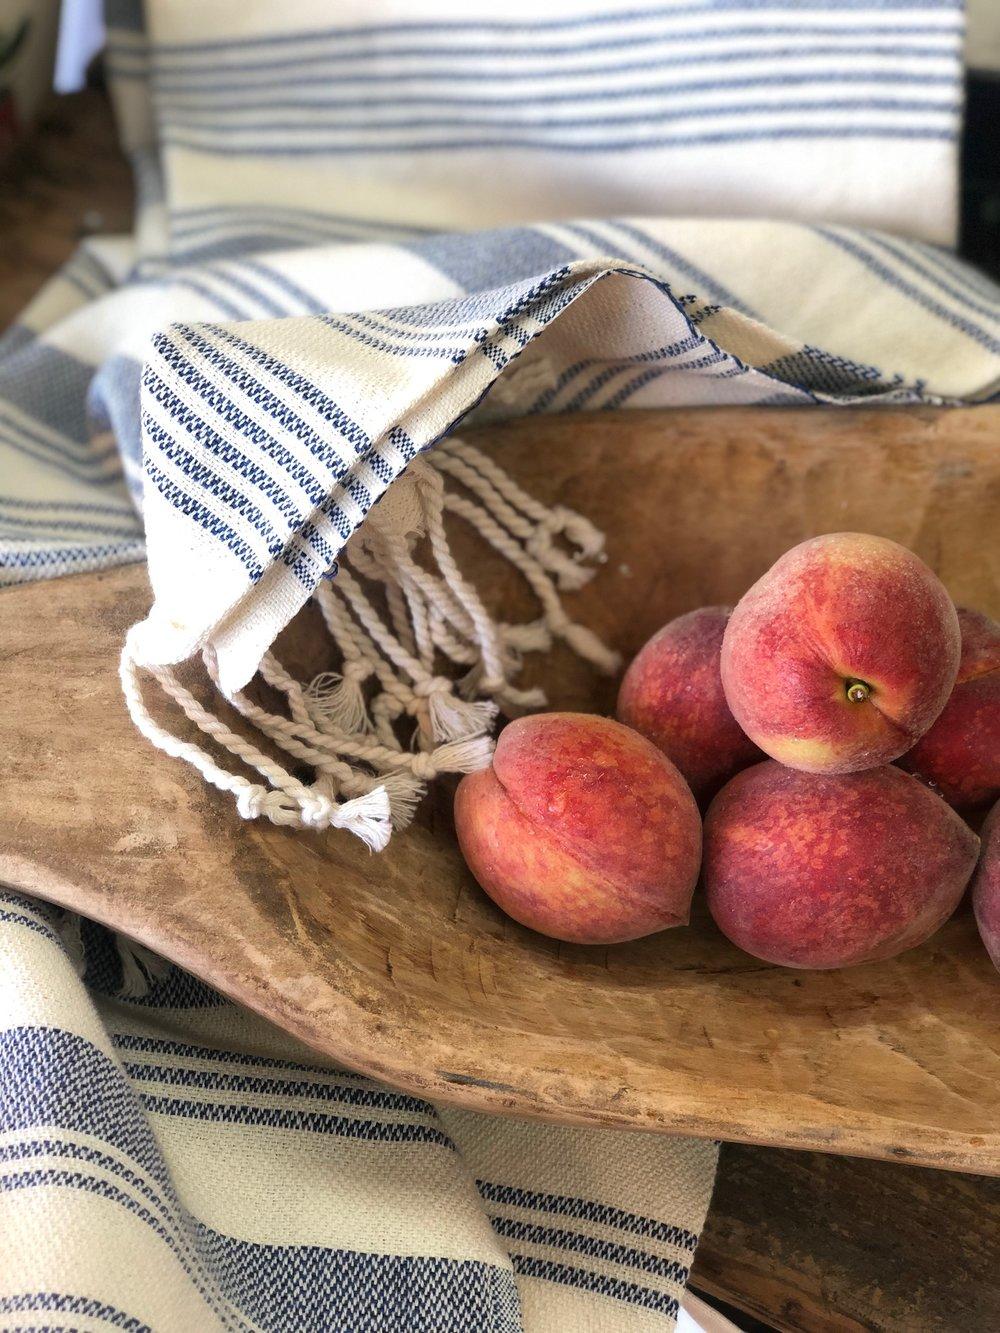 Rich May Peaches /  Burnette Farms - Thorsby, Alabama